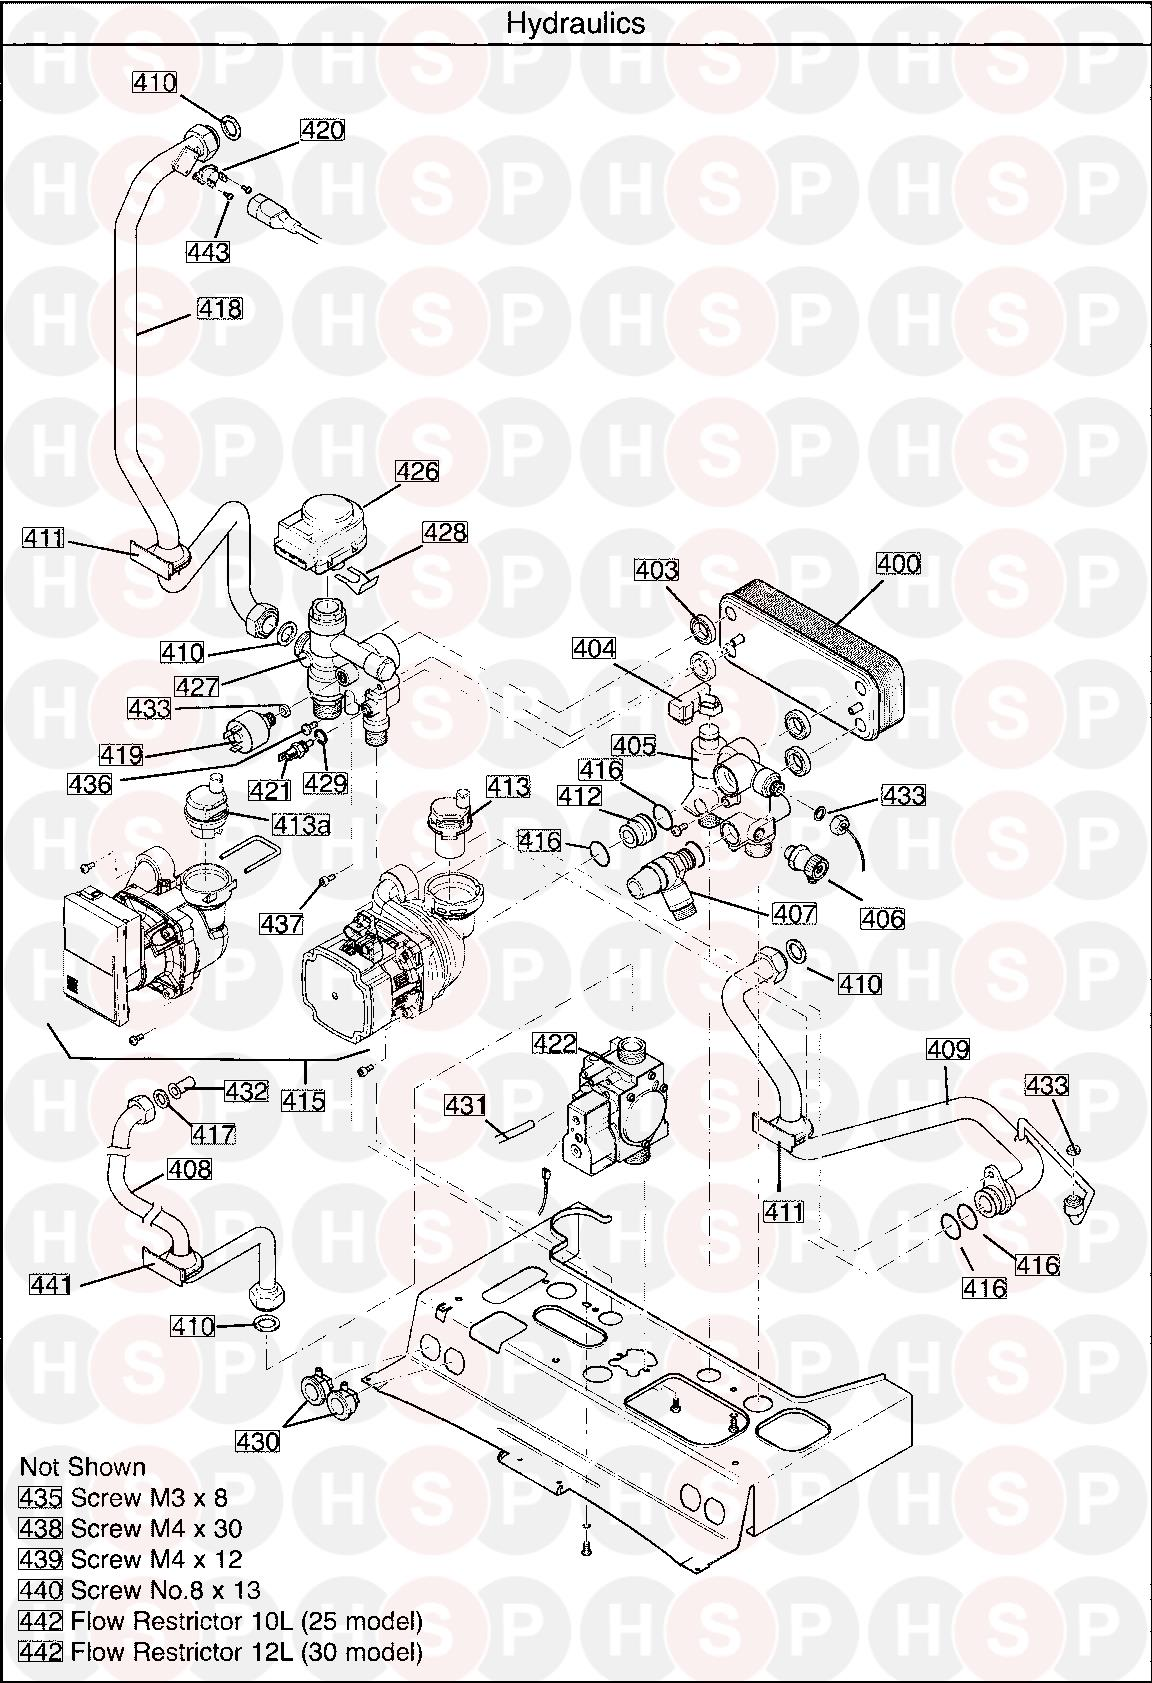 Main 30 Combi Erp  Serial No Ending Ac   Hydraulics Diagram